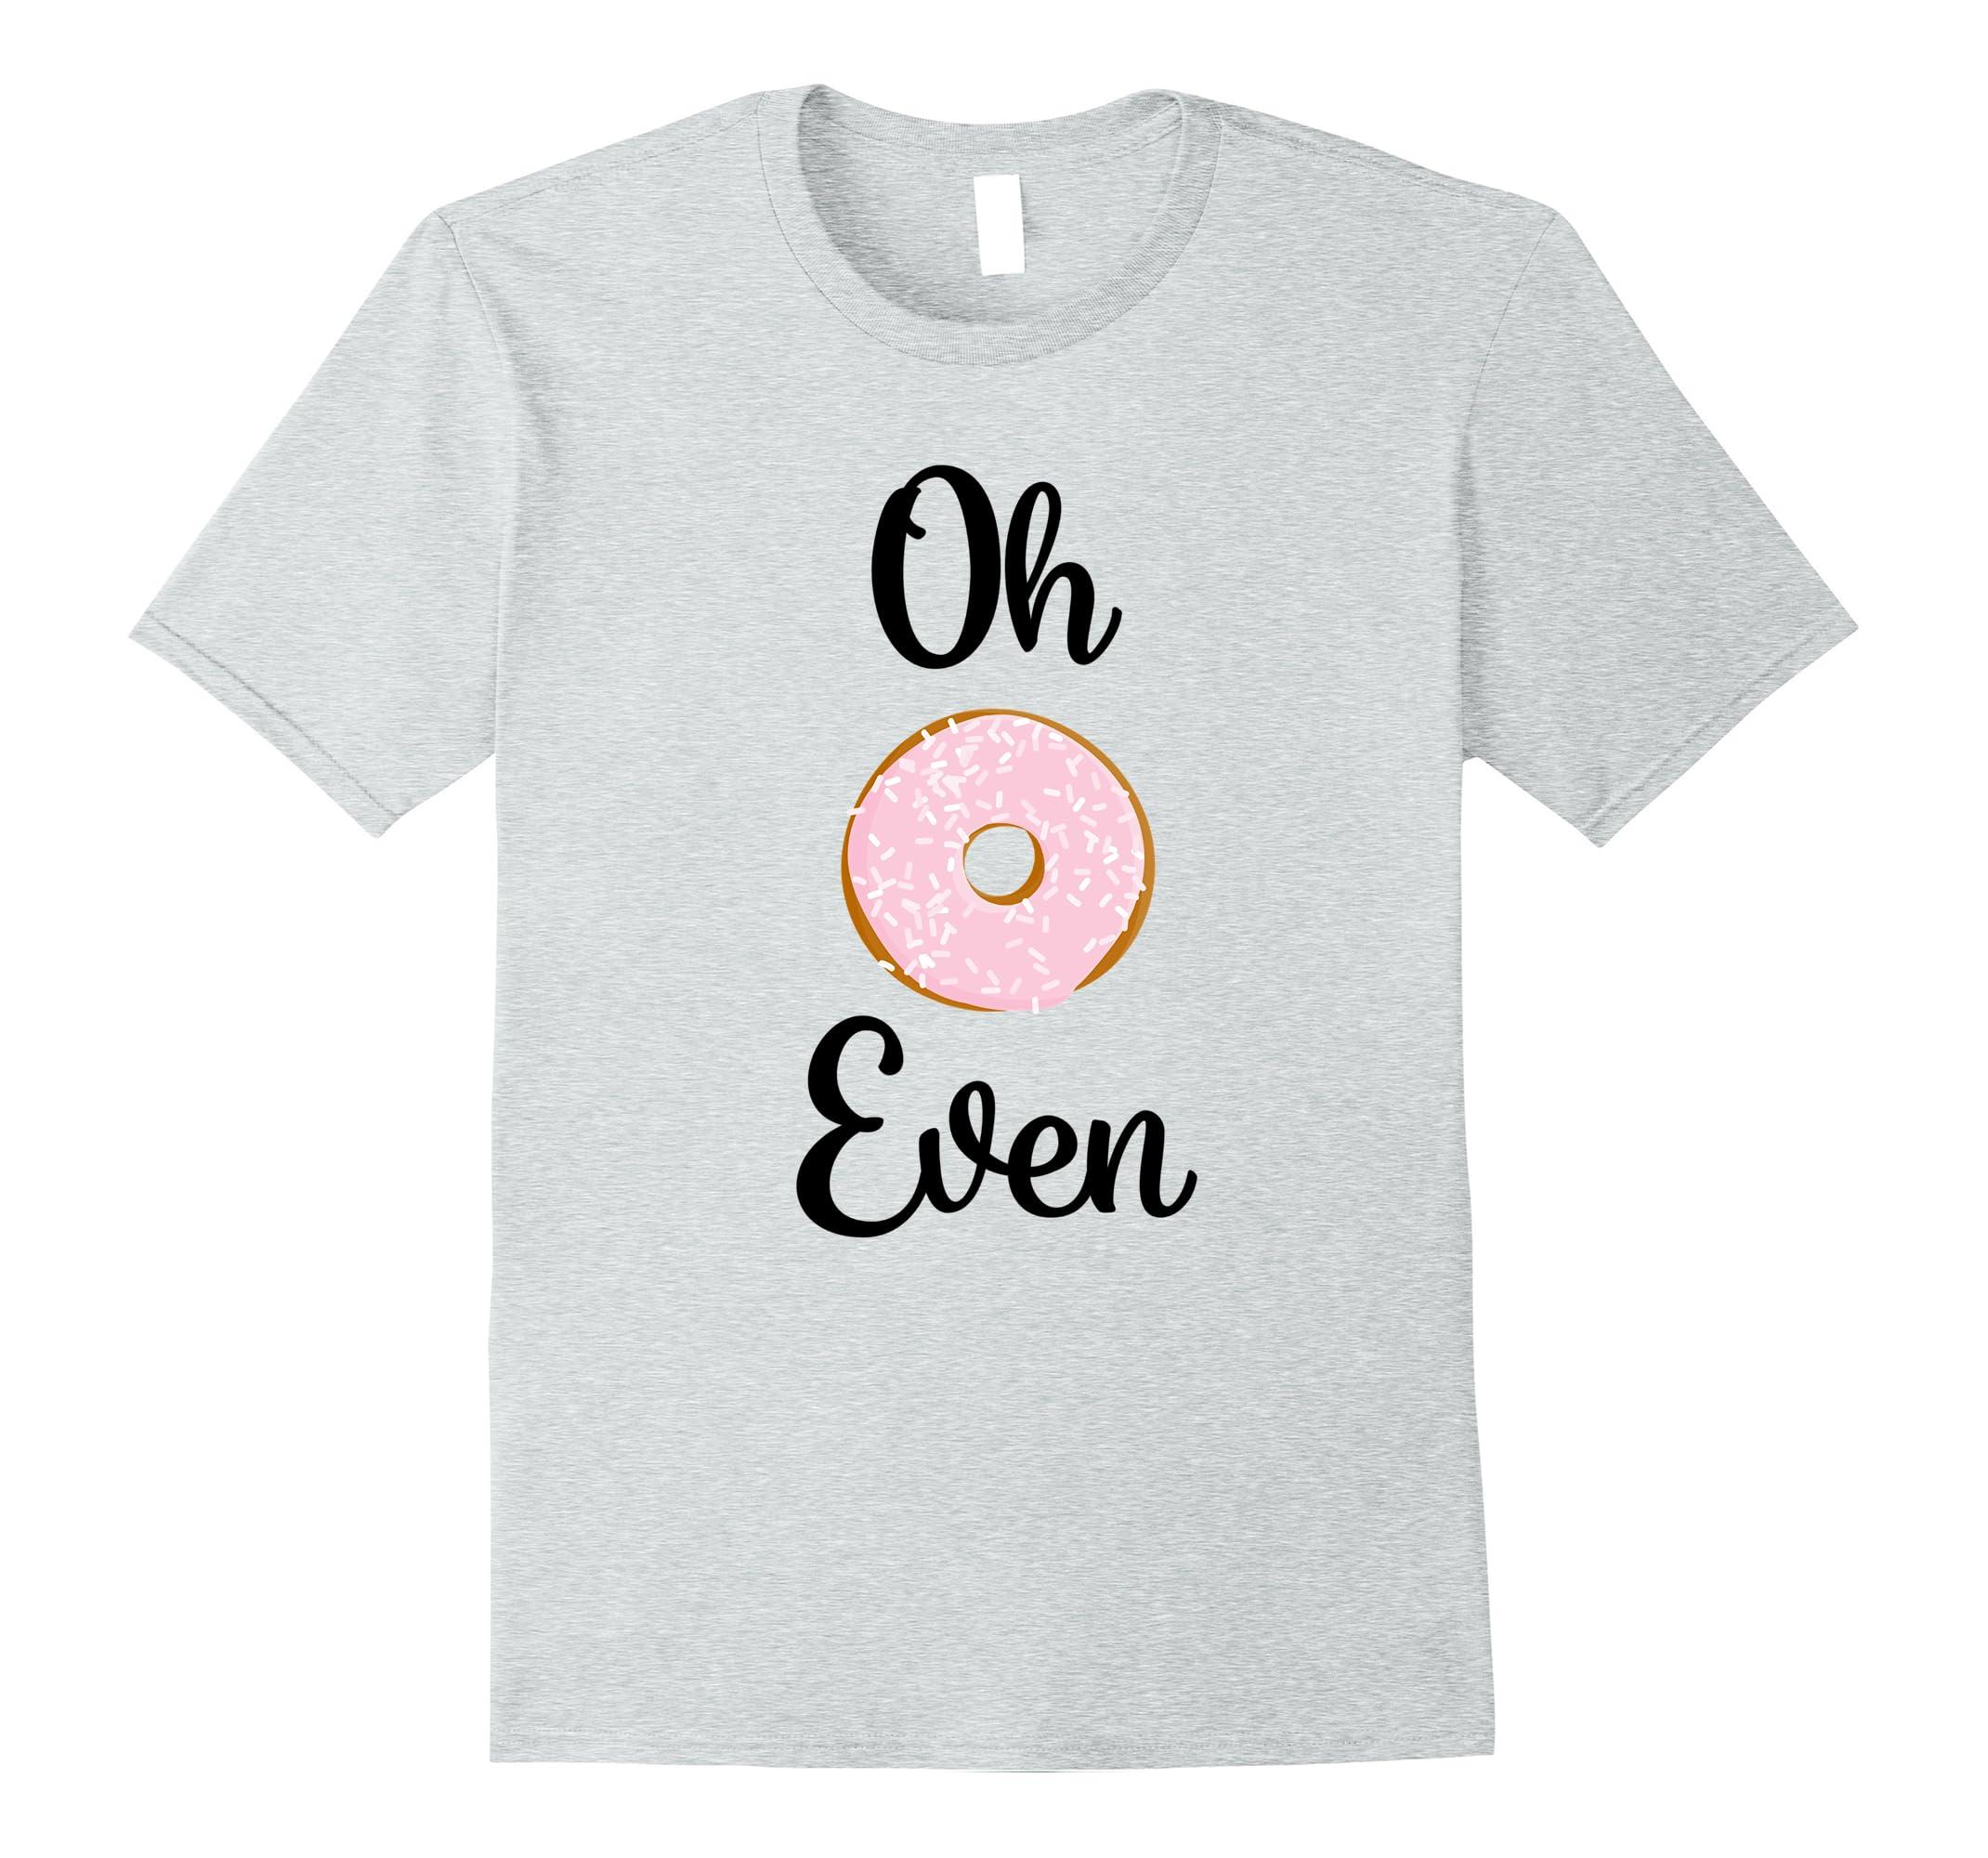 eb189ed57 Oh Donut Do Not Even Tee Shirt T-Shirt Mama Honey-ah my shirt one ...